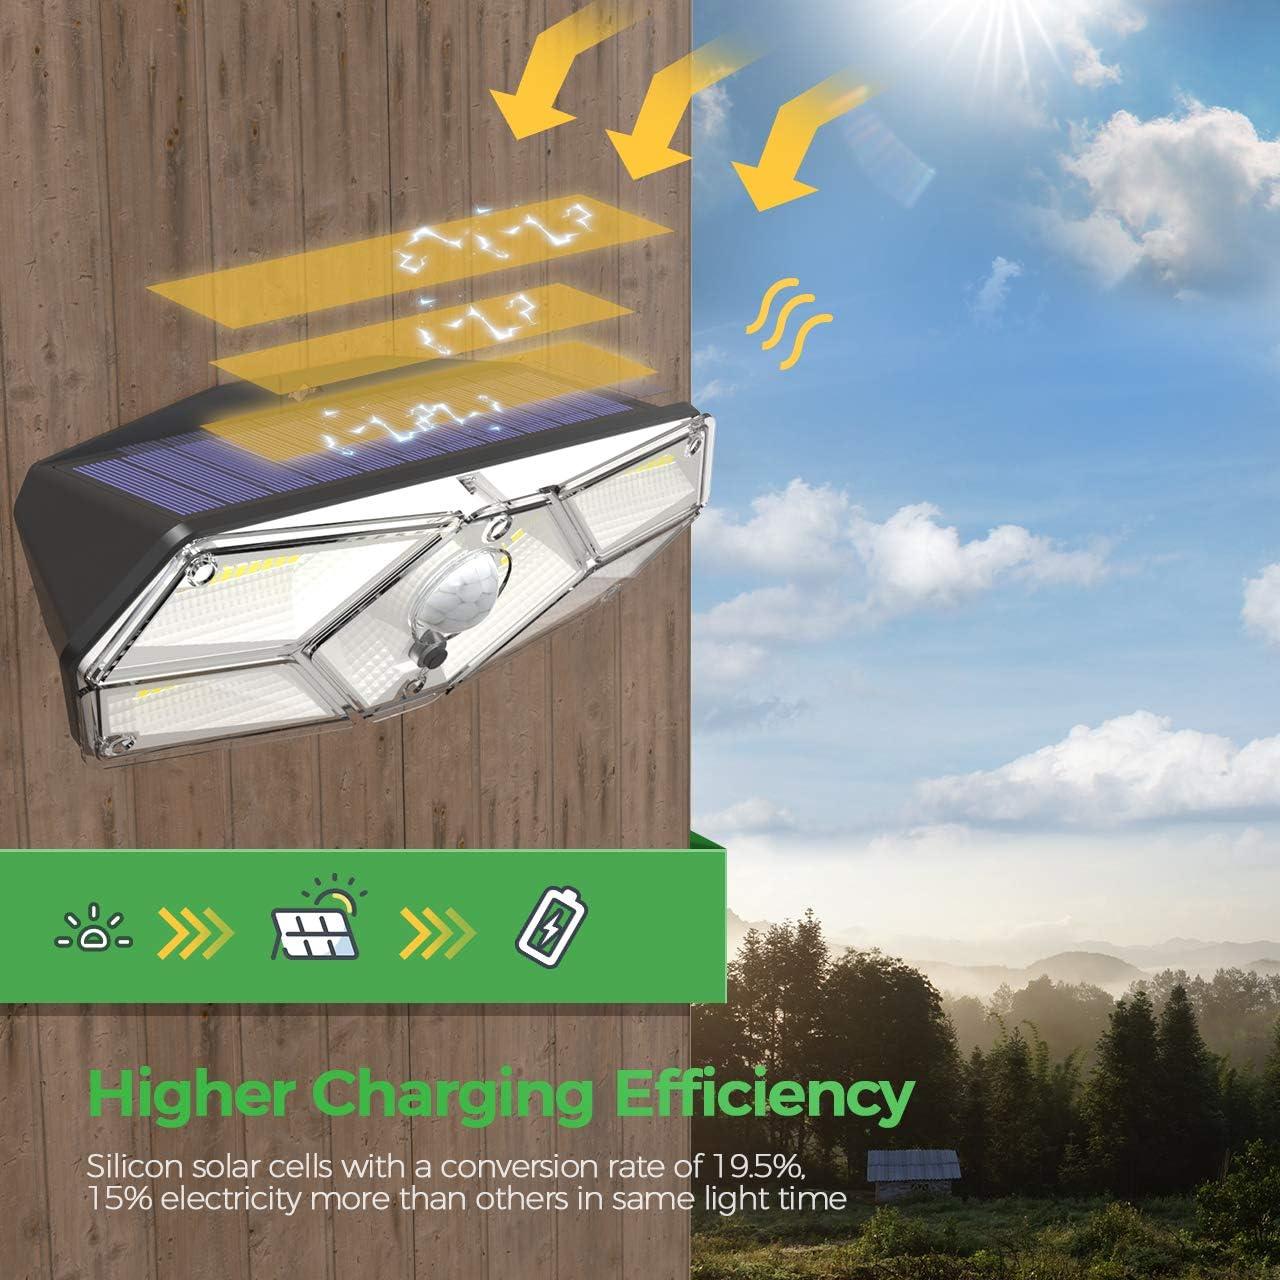 2 Pack TRODEEM 40 LED Solar Motion Sensor Lights Outdoor IP67 Waterproof Solar Powered Security Lights Wireless Solar Wall Lights for Garden Patio Yard Deck Garage Fence Pool